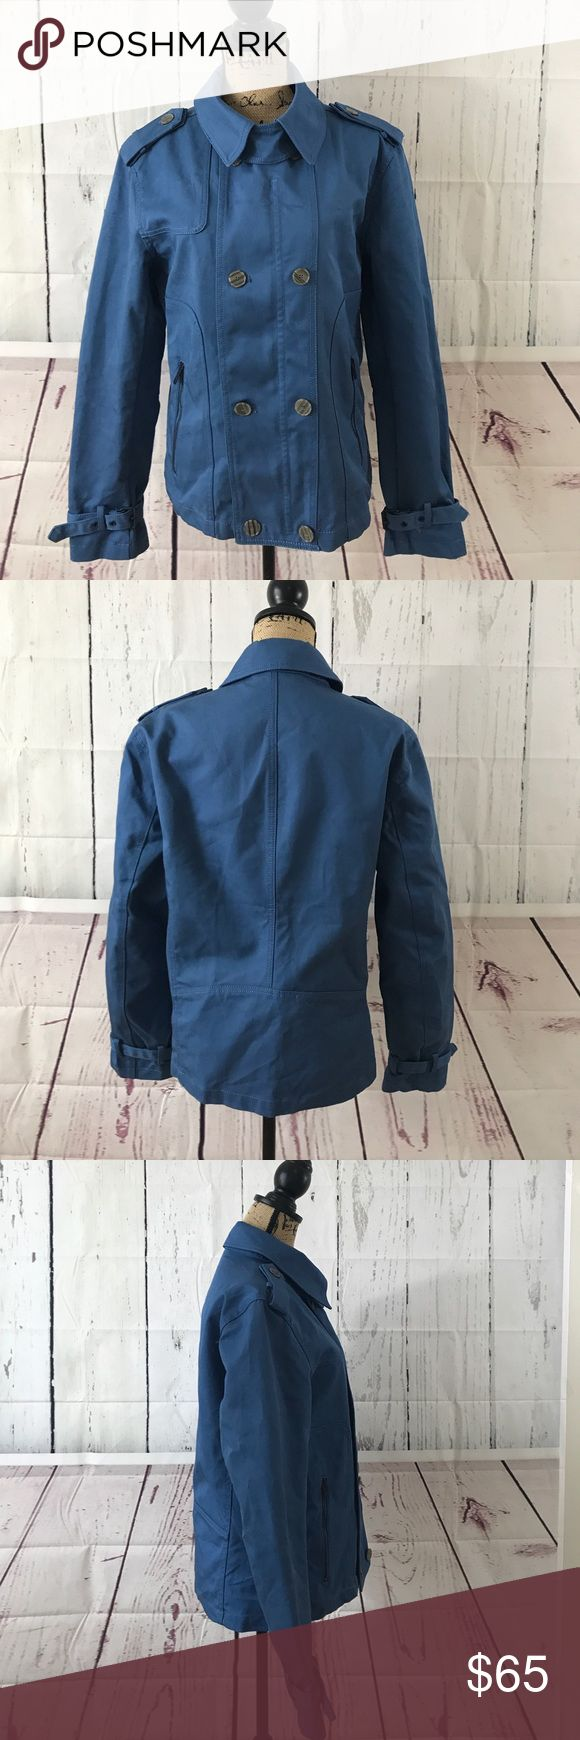 ZARA MAN Jacket Blue Size XL Smoke Free Home! Same or Next Day Shipping. Zara Jackets & Coats Military & Field